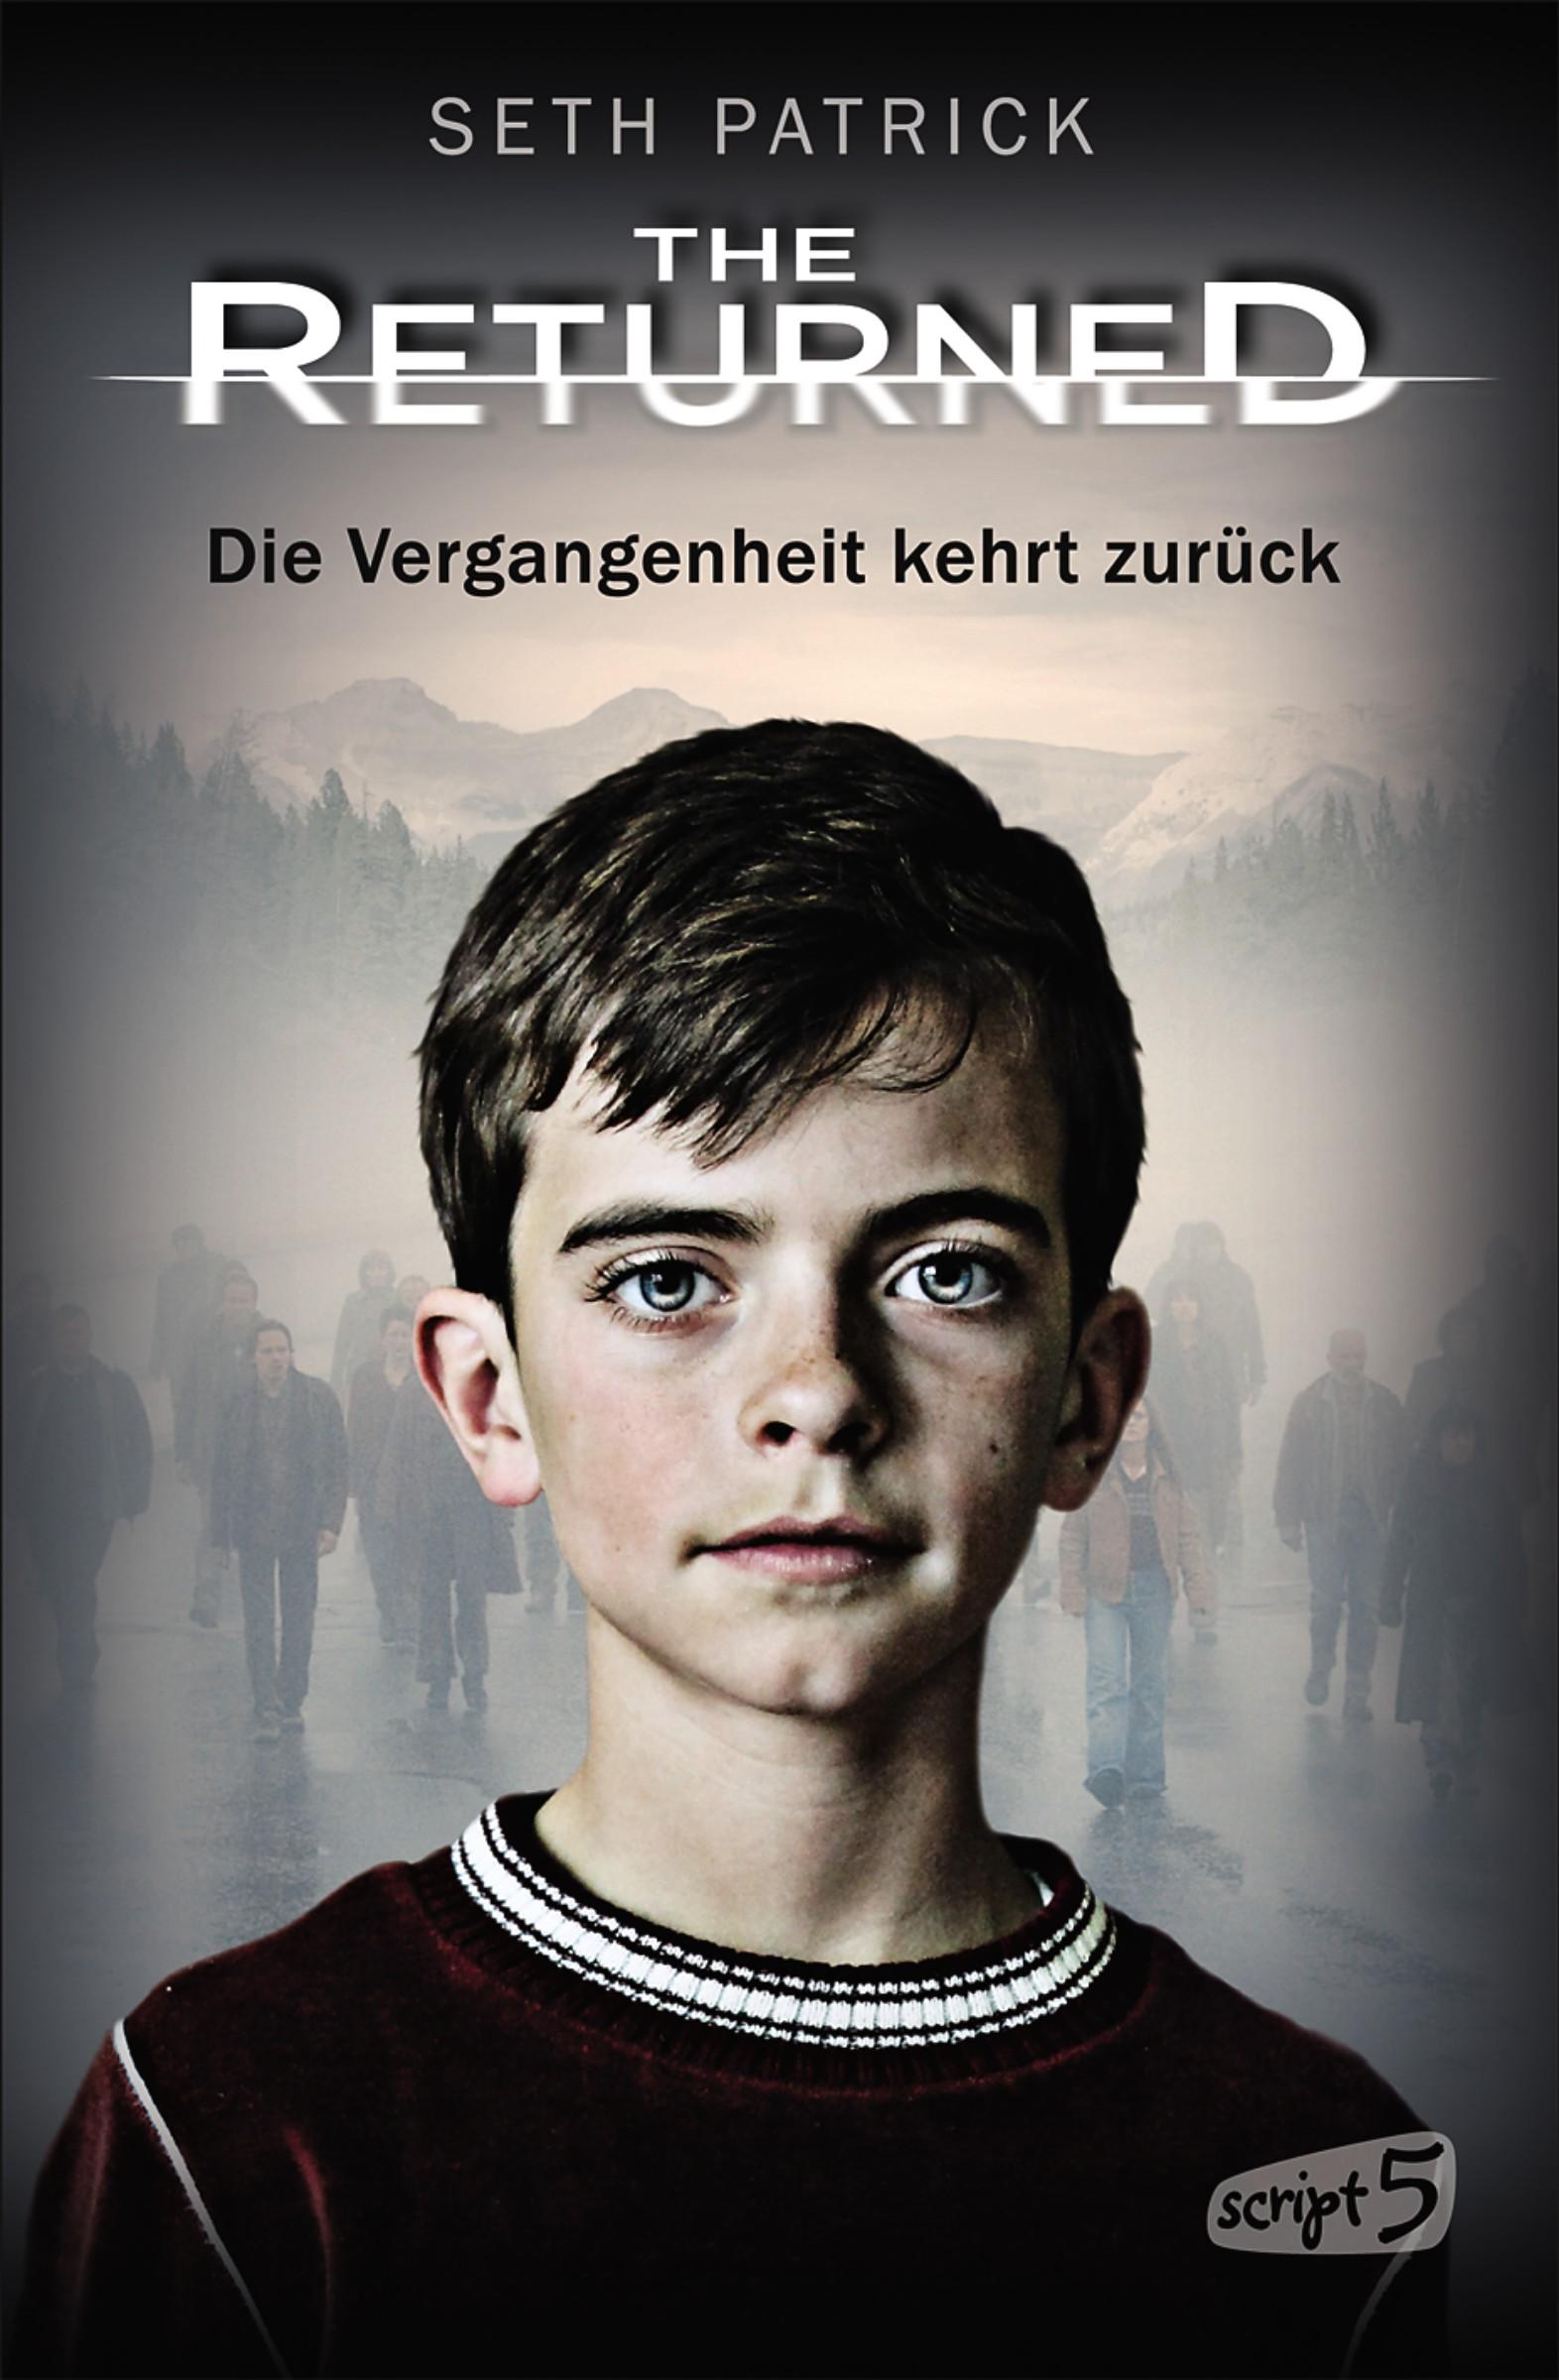 Seth Patrick The Returned - Die Vergangenheit kehrt zurück the returned